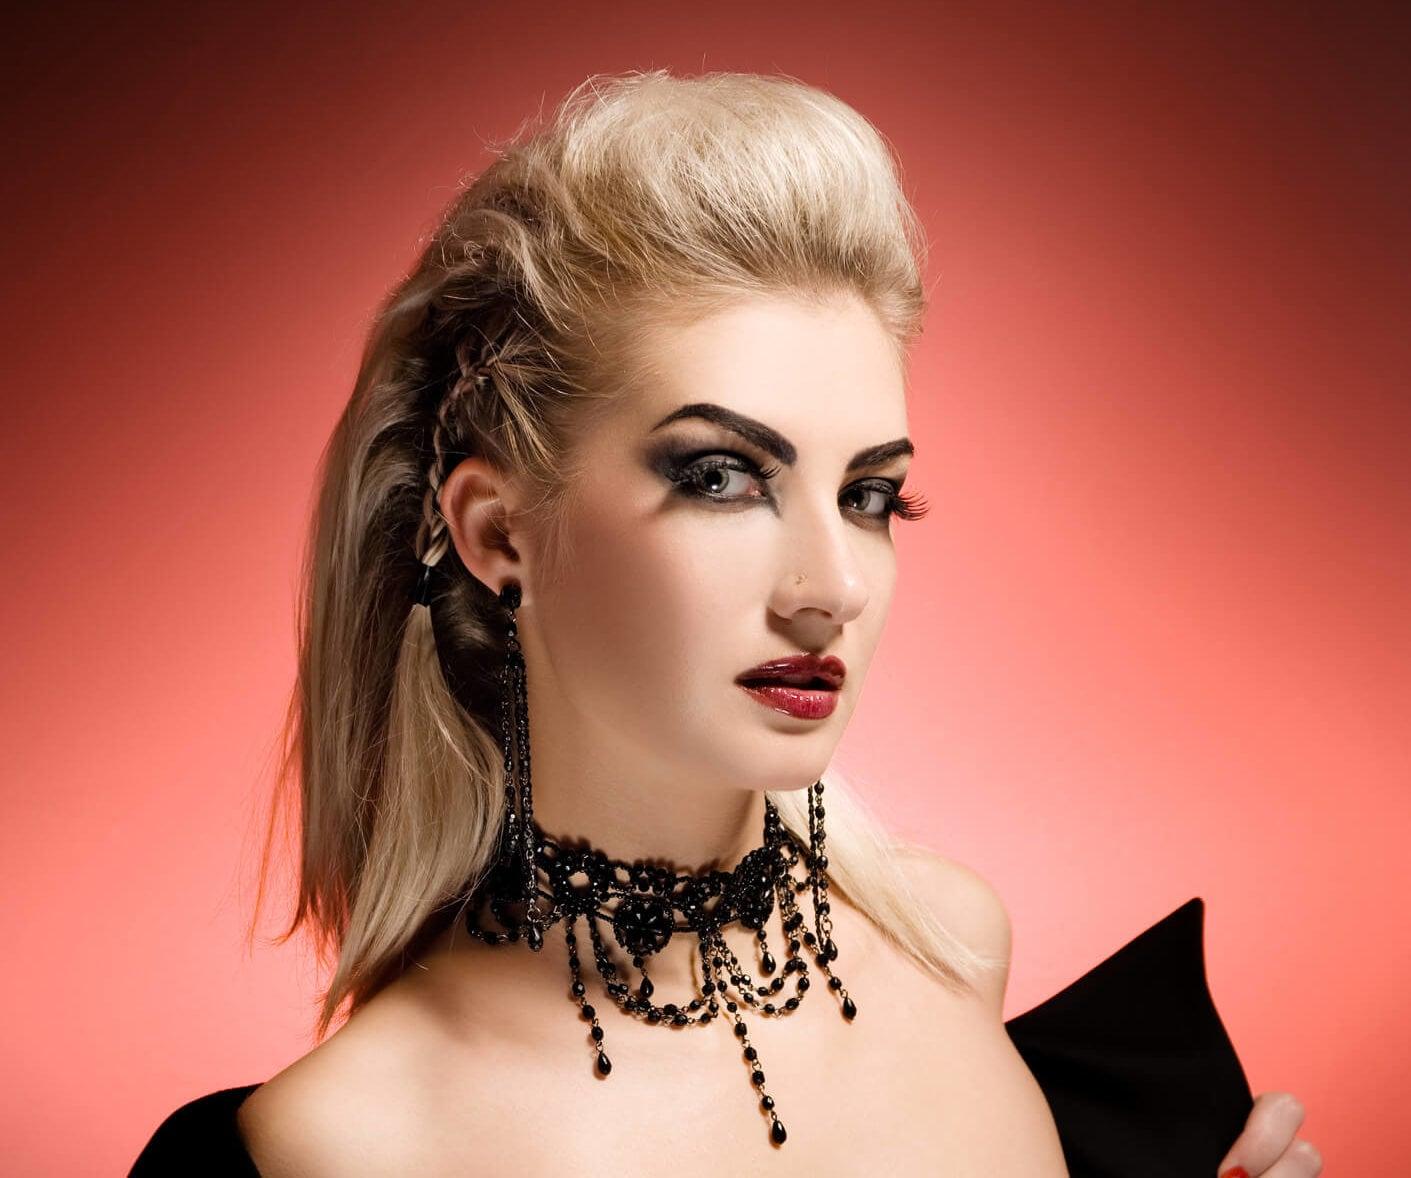 peinados halloween de guerrera